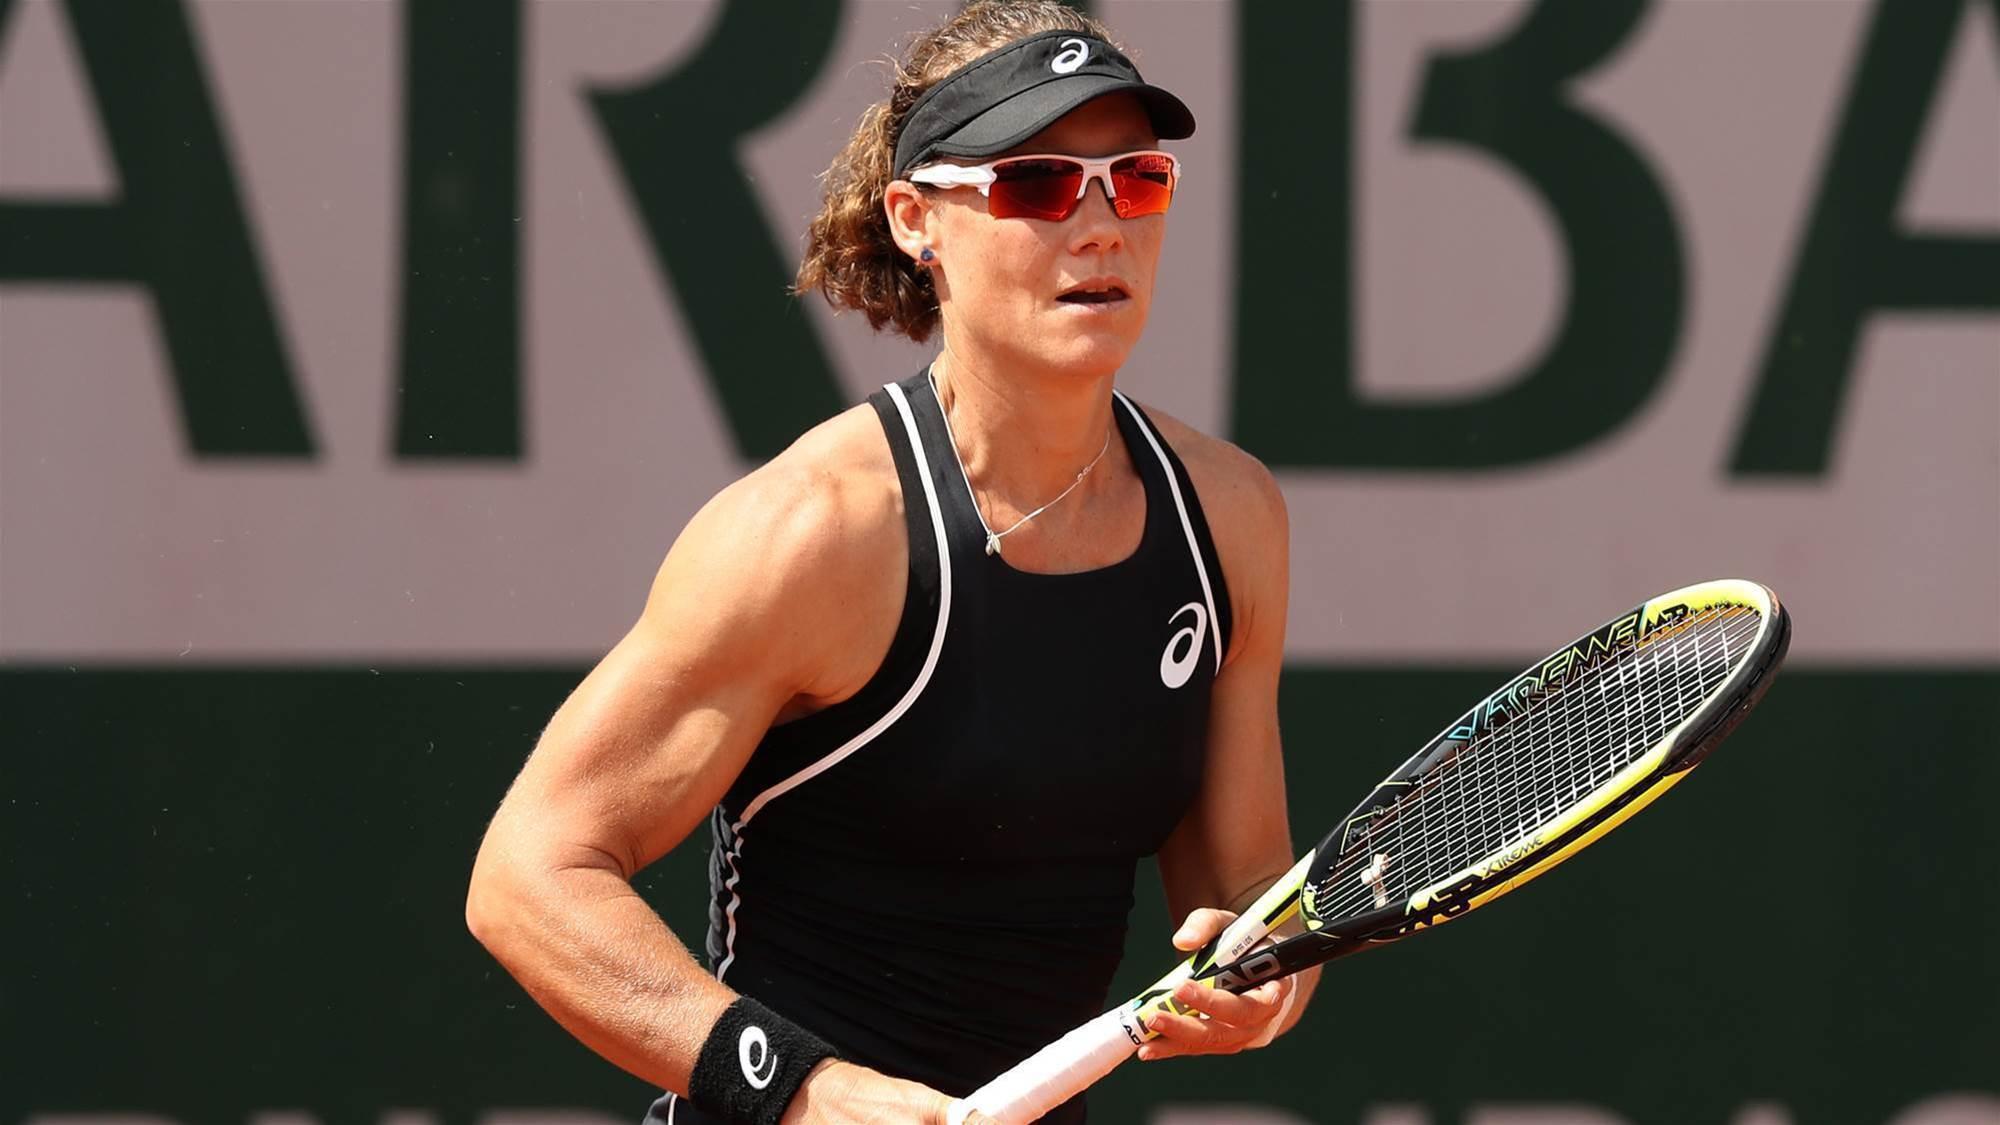 Stosur and Gavrilova through to third round